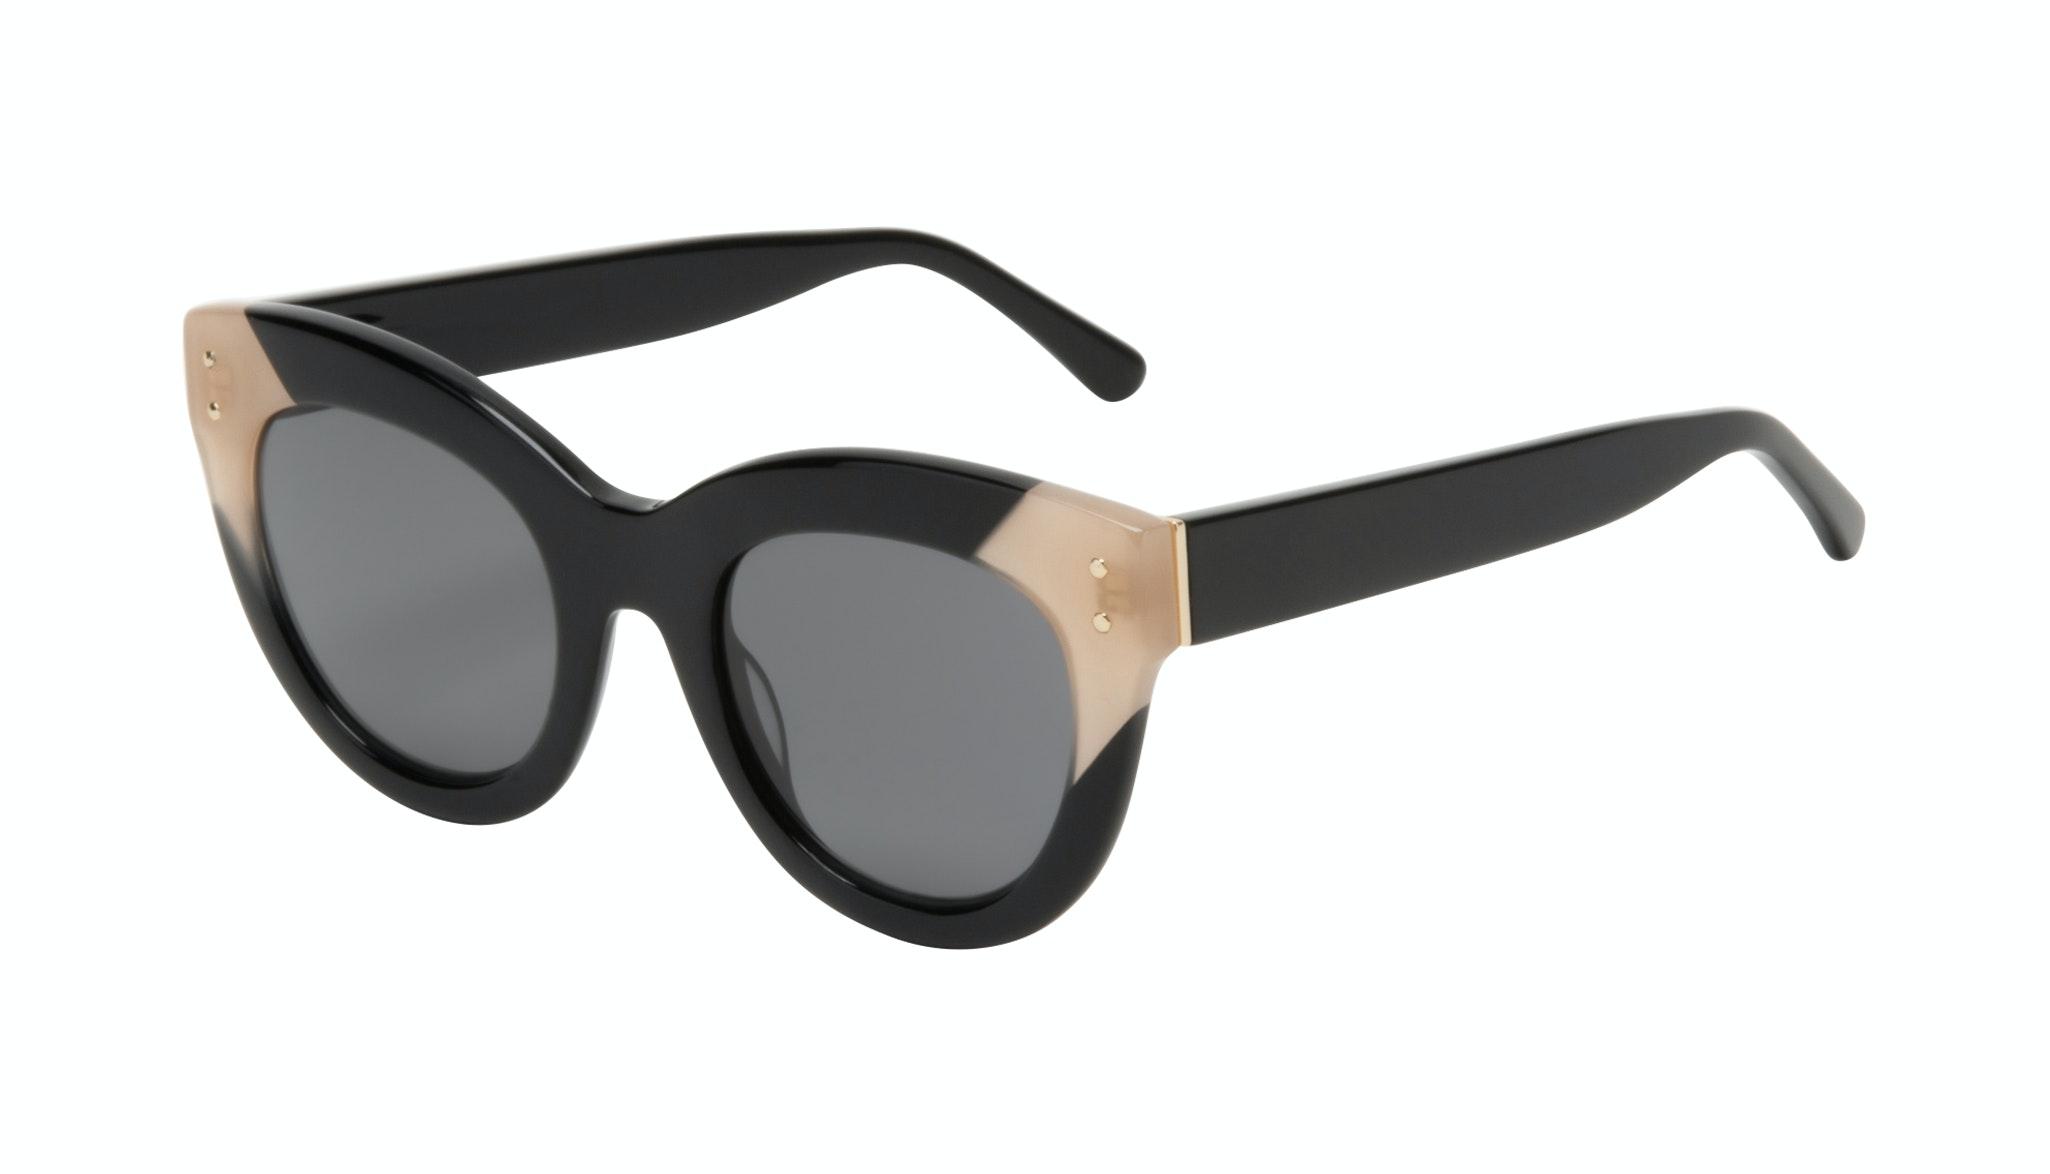 Affordable Fashion Glasses Cat Eye Sunglasses Women Groove Onyx Tilt